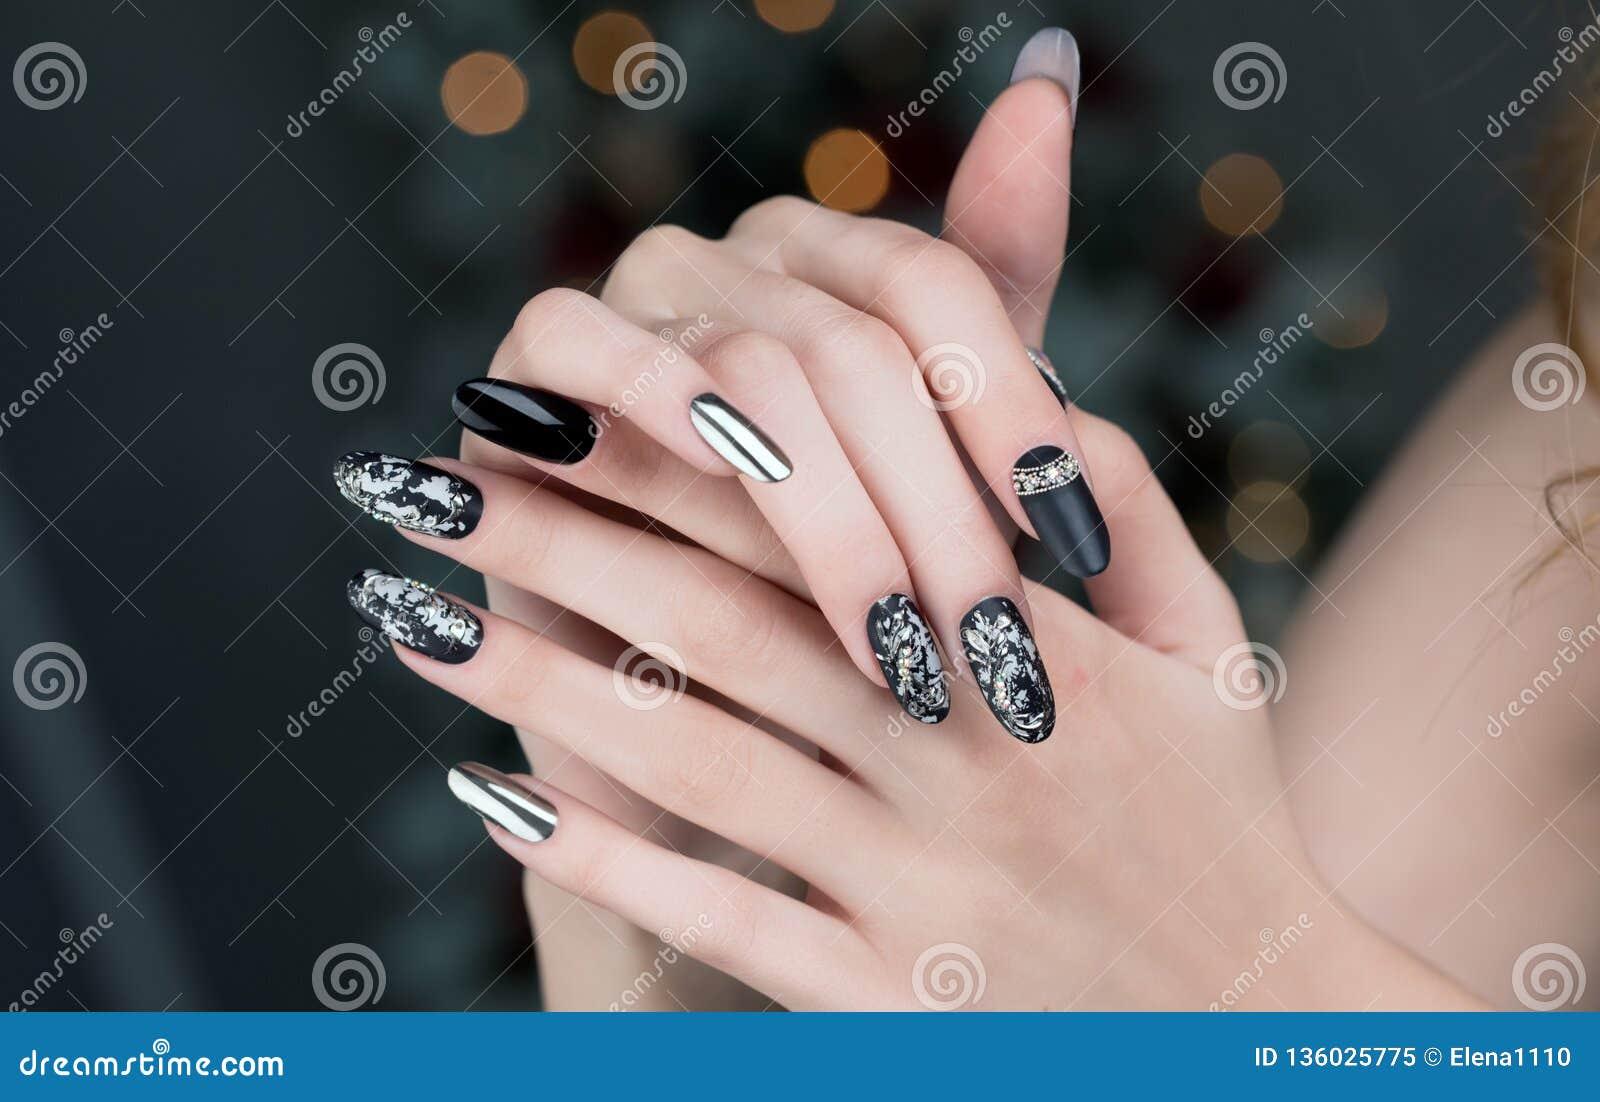 Beautiful Nail Art Manicure Stock Image Image Of Style Nailish 136025775